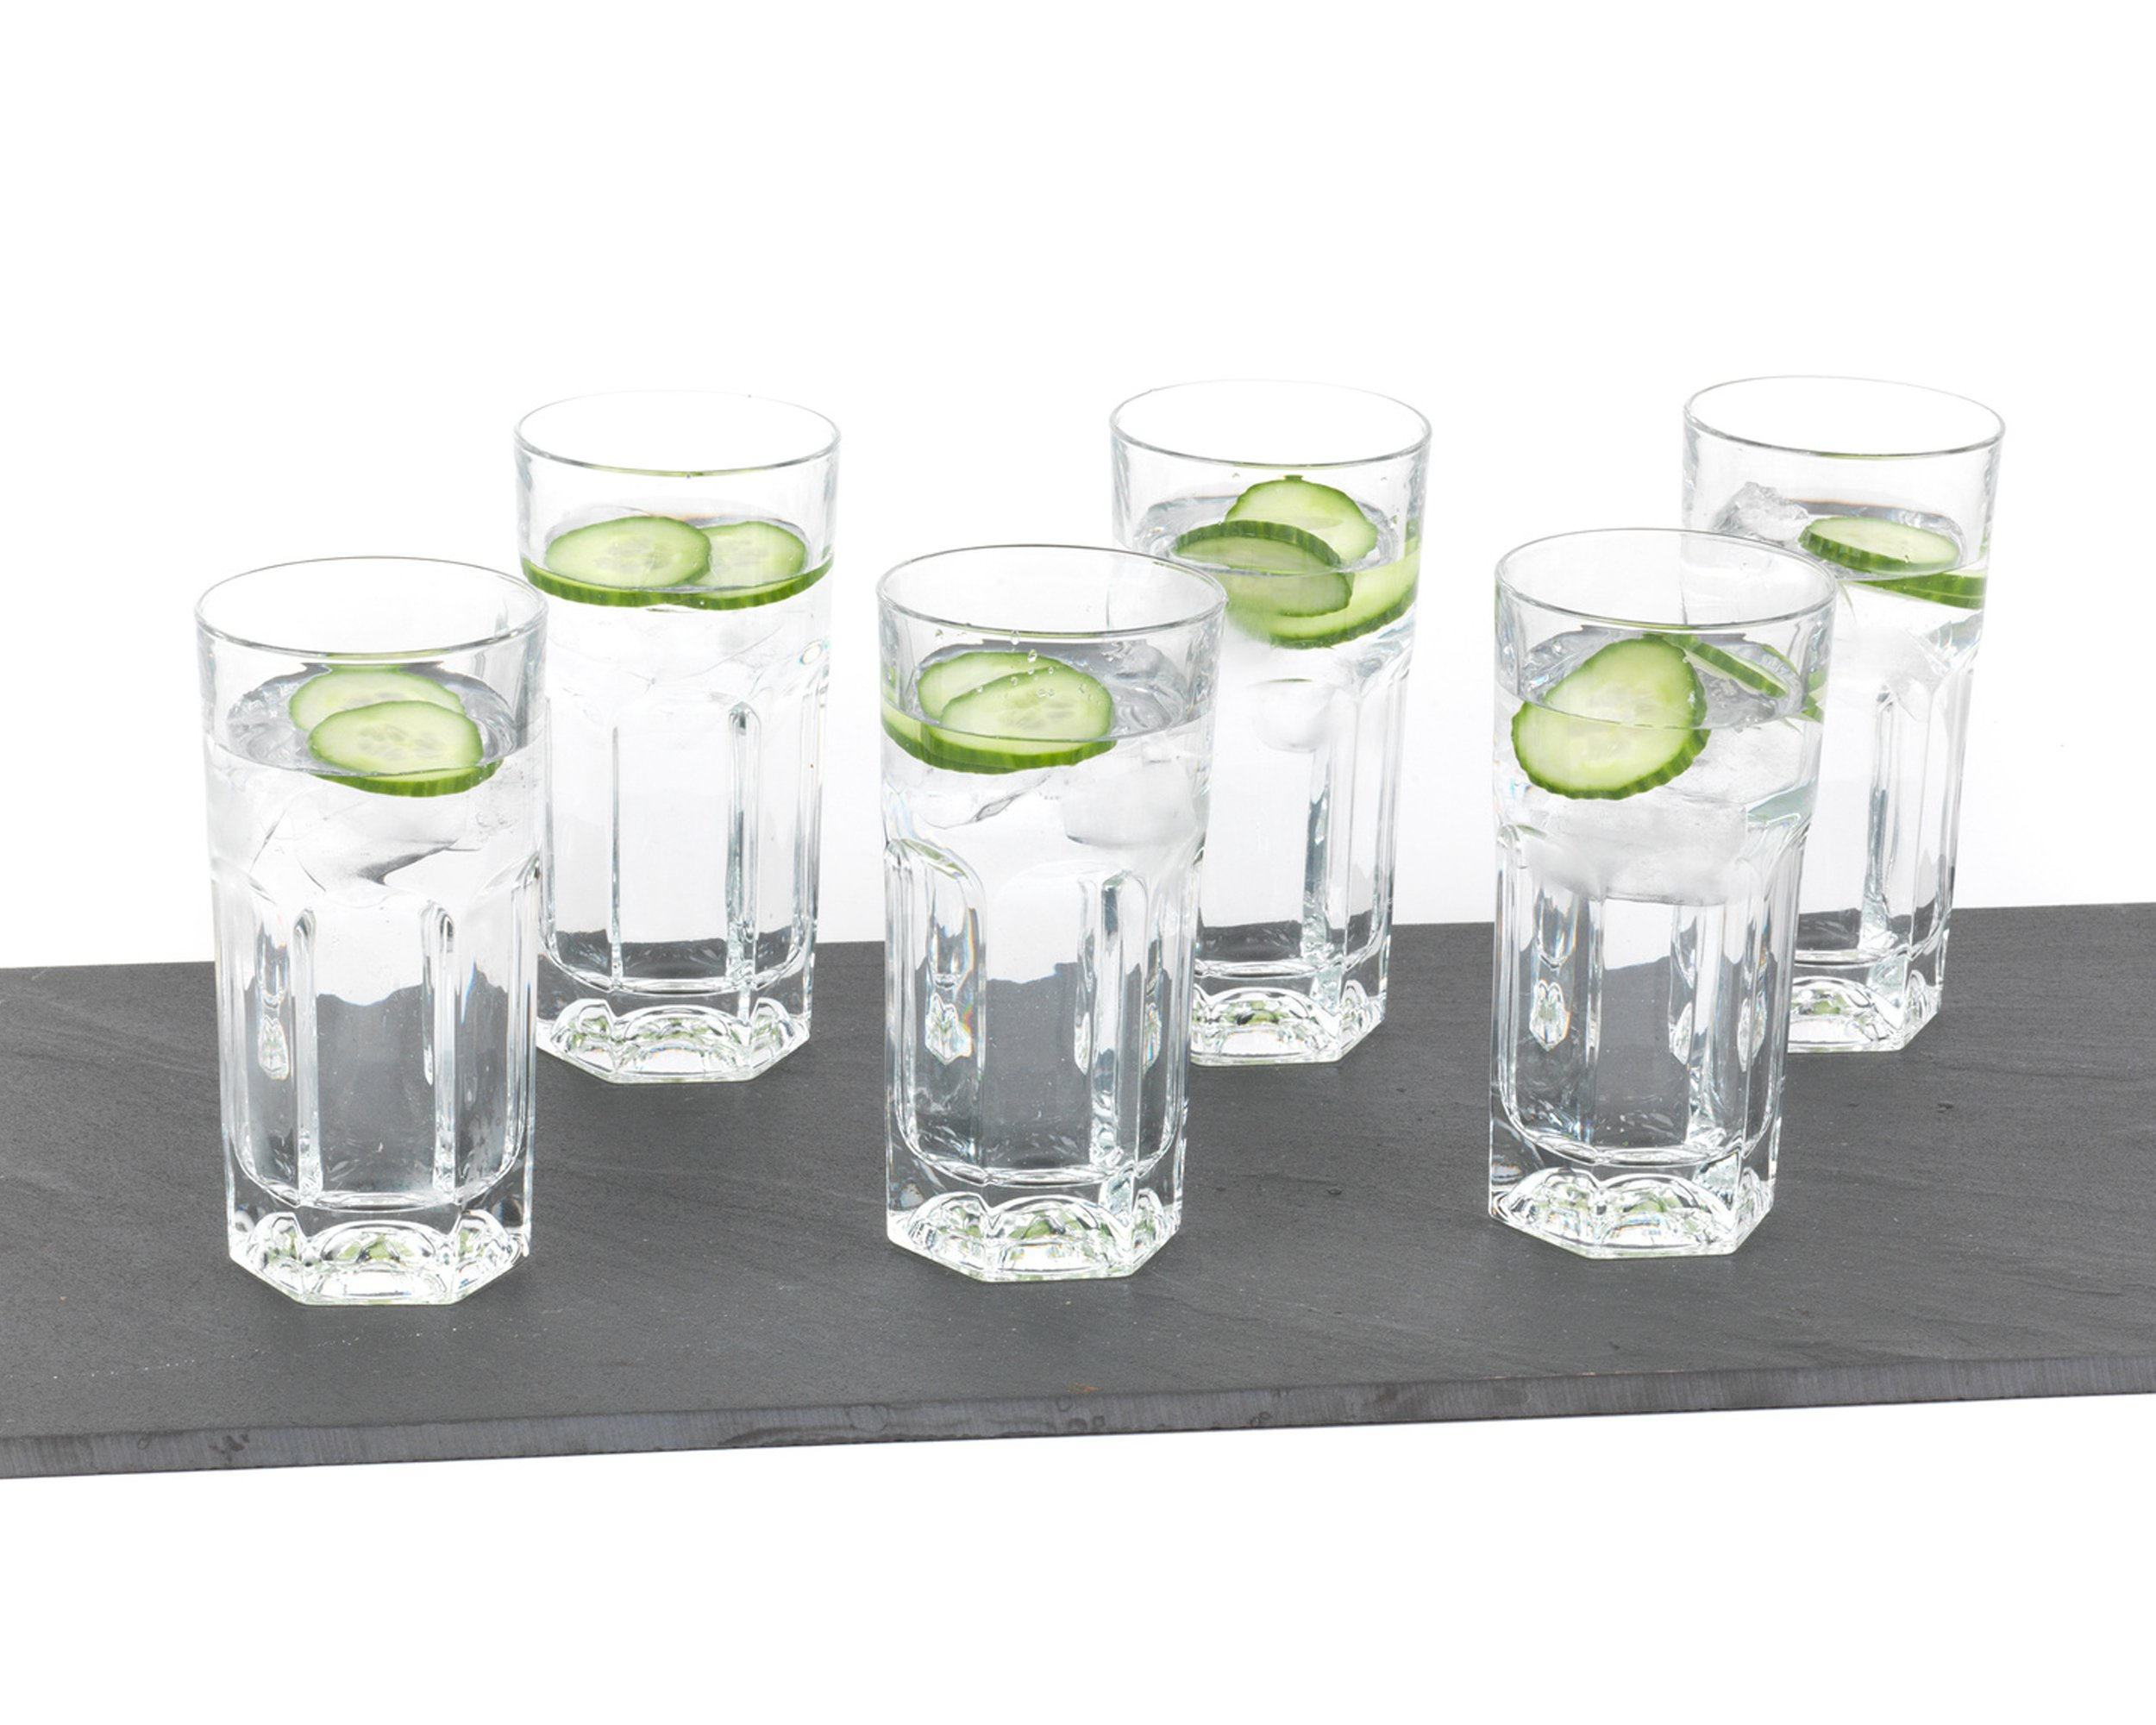 RCR 23829020006 Provenza Crystal Hi-Ball Cocktail Water Tumblers Glasses, 370 ml, Set of 6